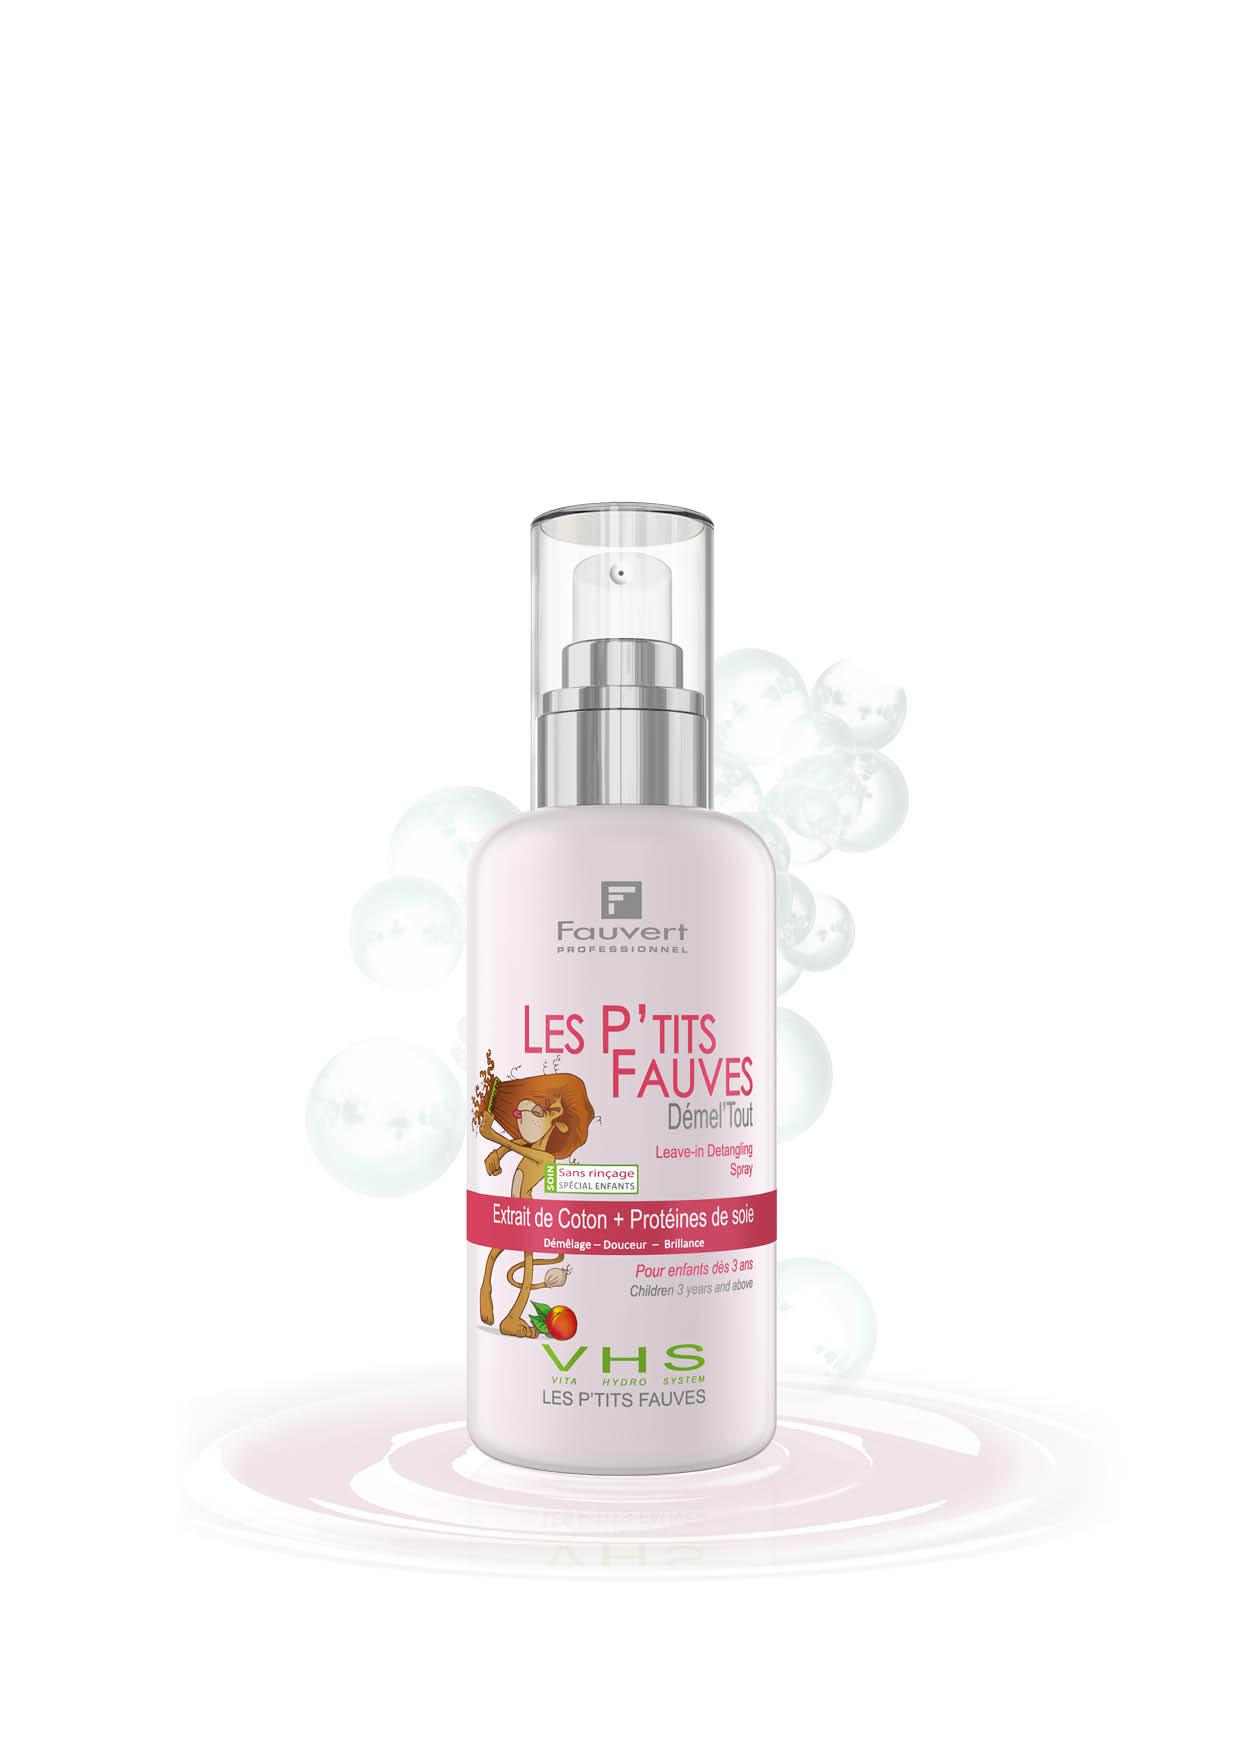 Demel'Tout Antiziep-Spray - Leave-in - Kinderpflege - Vita Hydro-System - Les PTit Fauves - 200ml